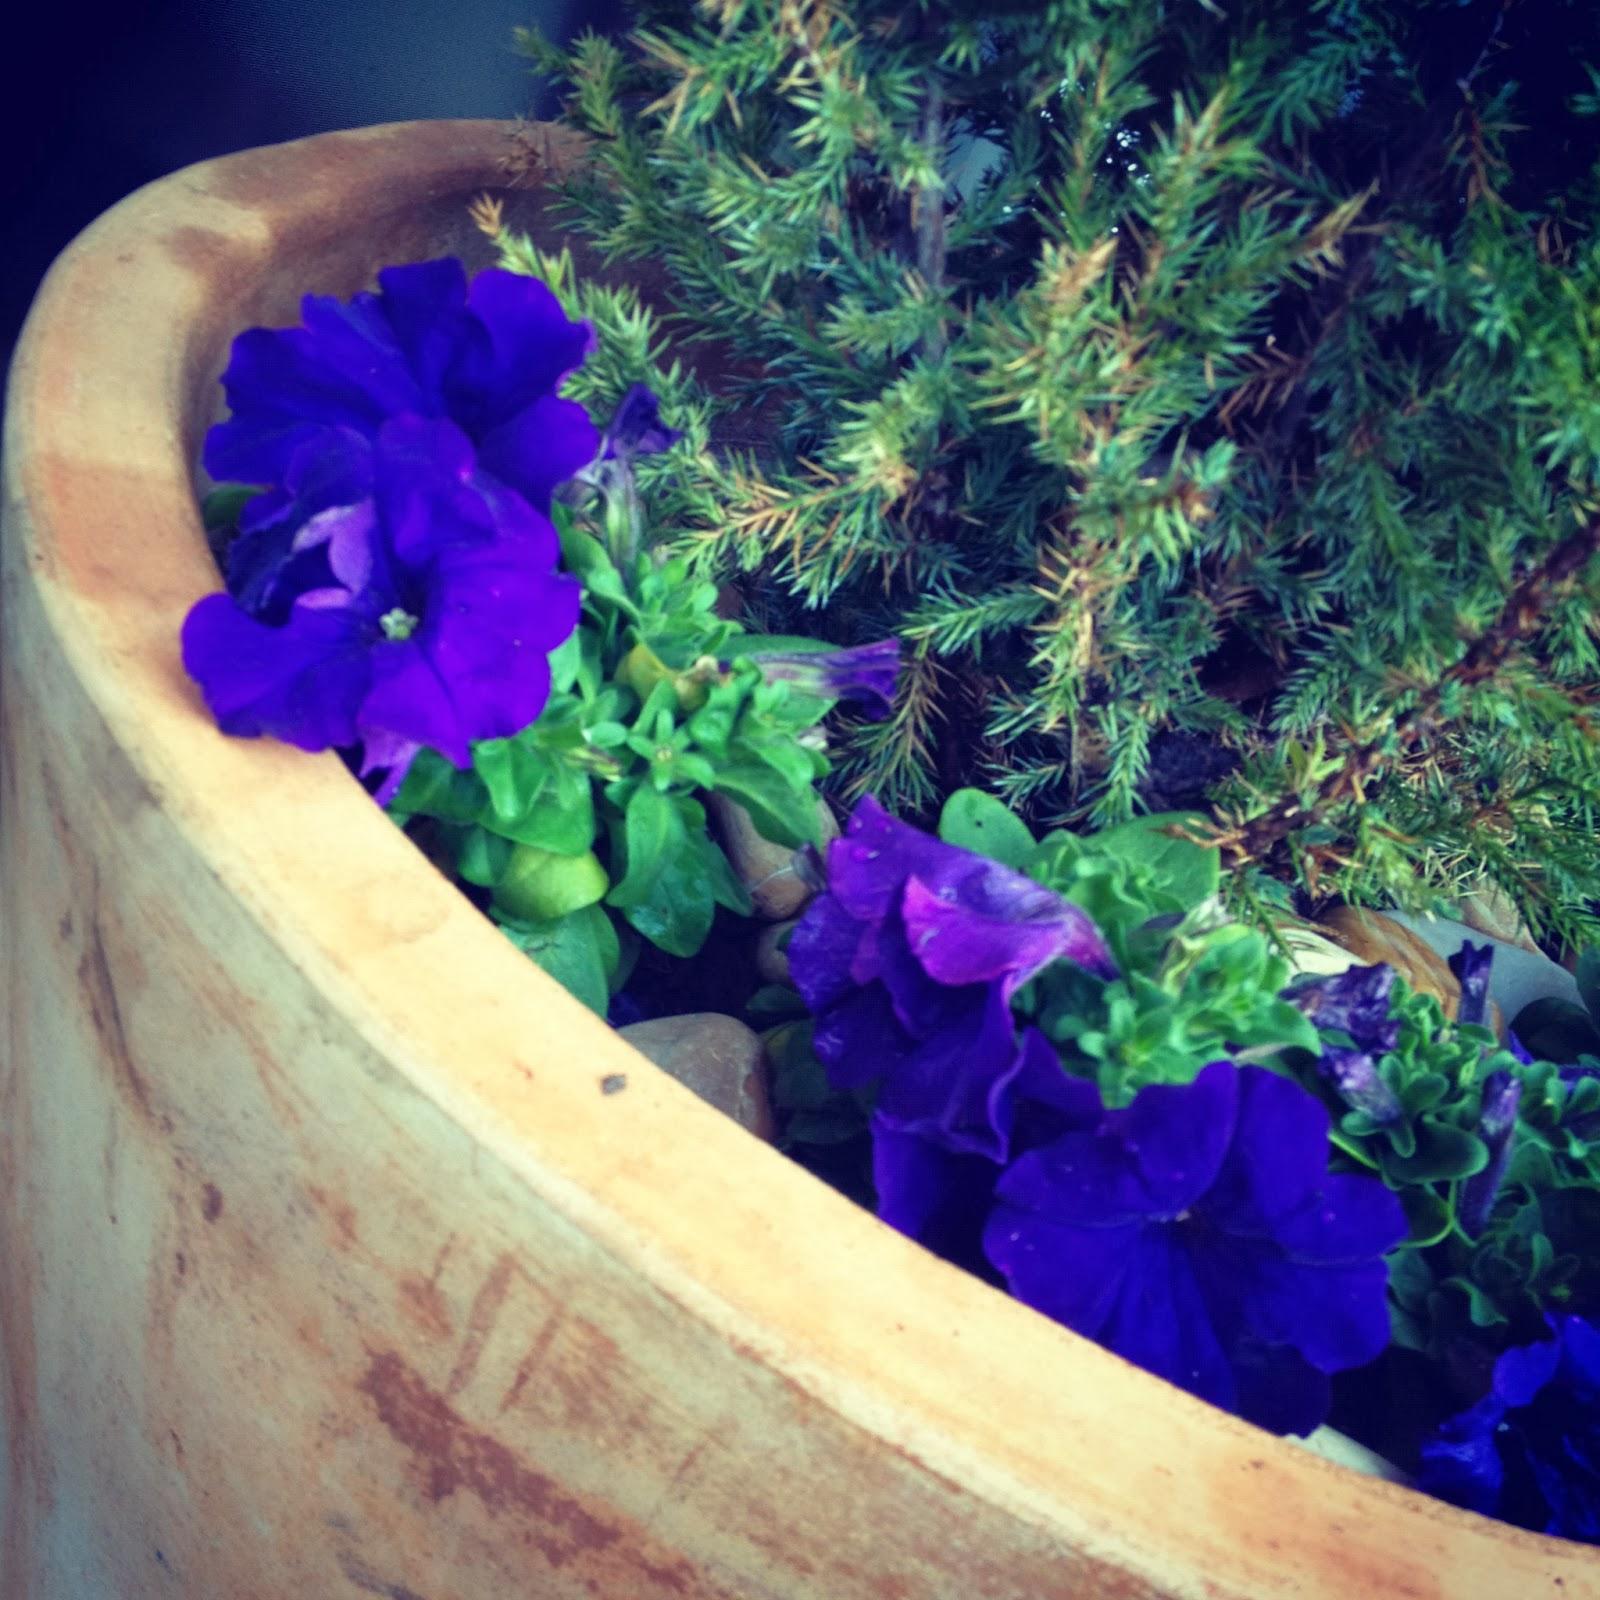 Fashion Friday - Picnic in the Park - Natasha in Oz - Autumn - Pot plant image